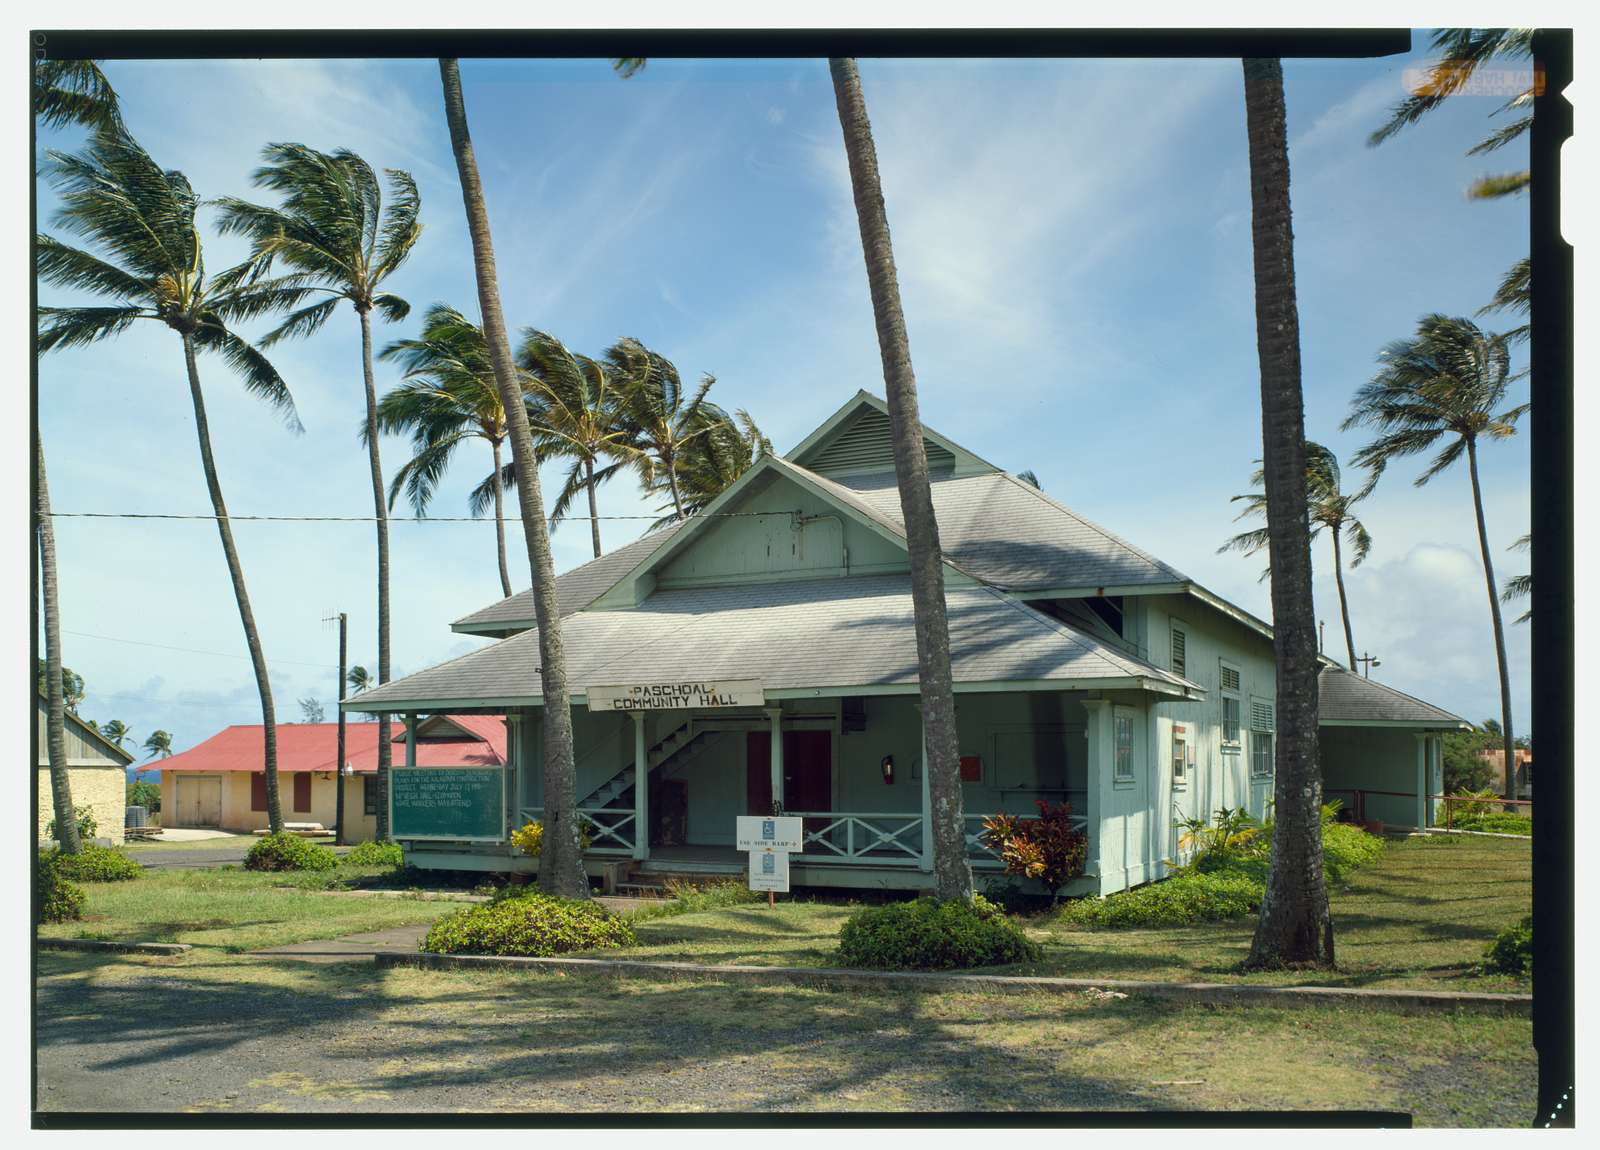 Kalaupapa Social Hall, Moloka'i Island, Kalaupapa, Kalawao County, HI